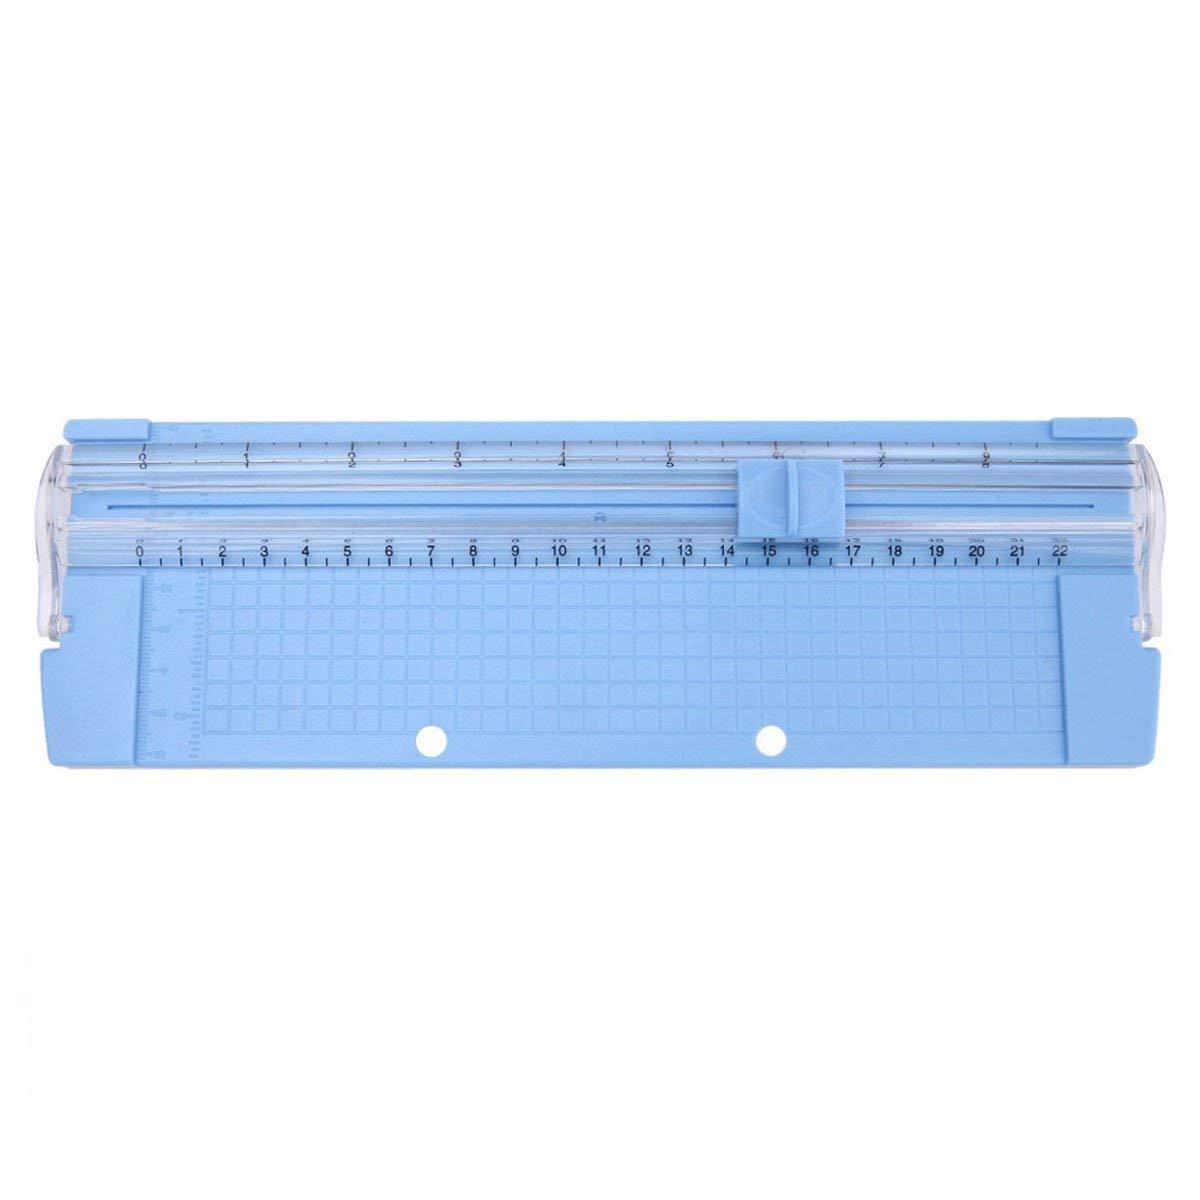 A4/A5 Portable Paper Trimmer Cutter Scrapbooking Tool Lightweight Precision Paper Photo Cutting Office Machine